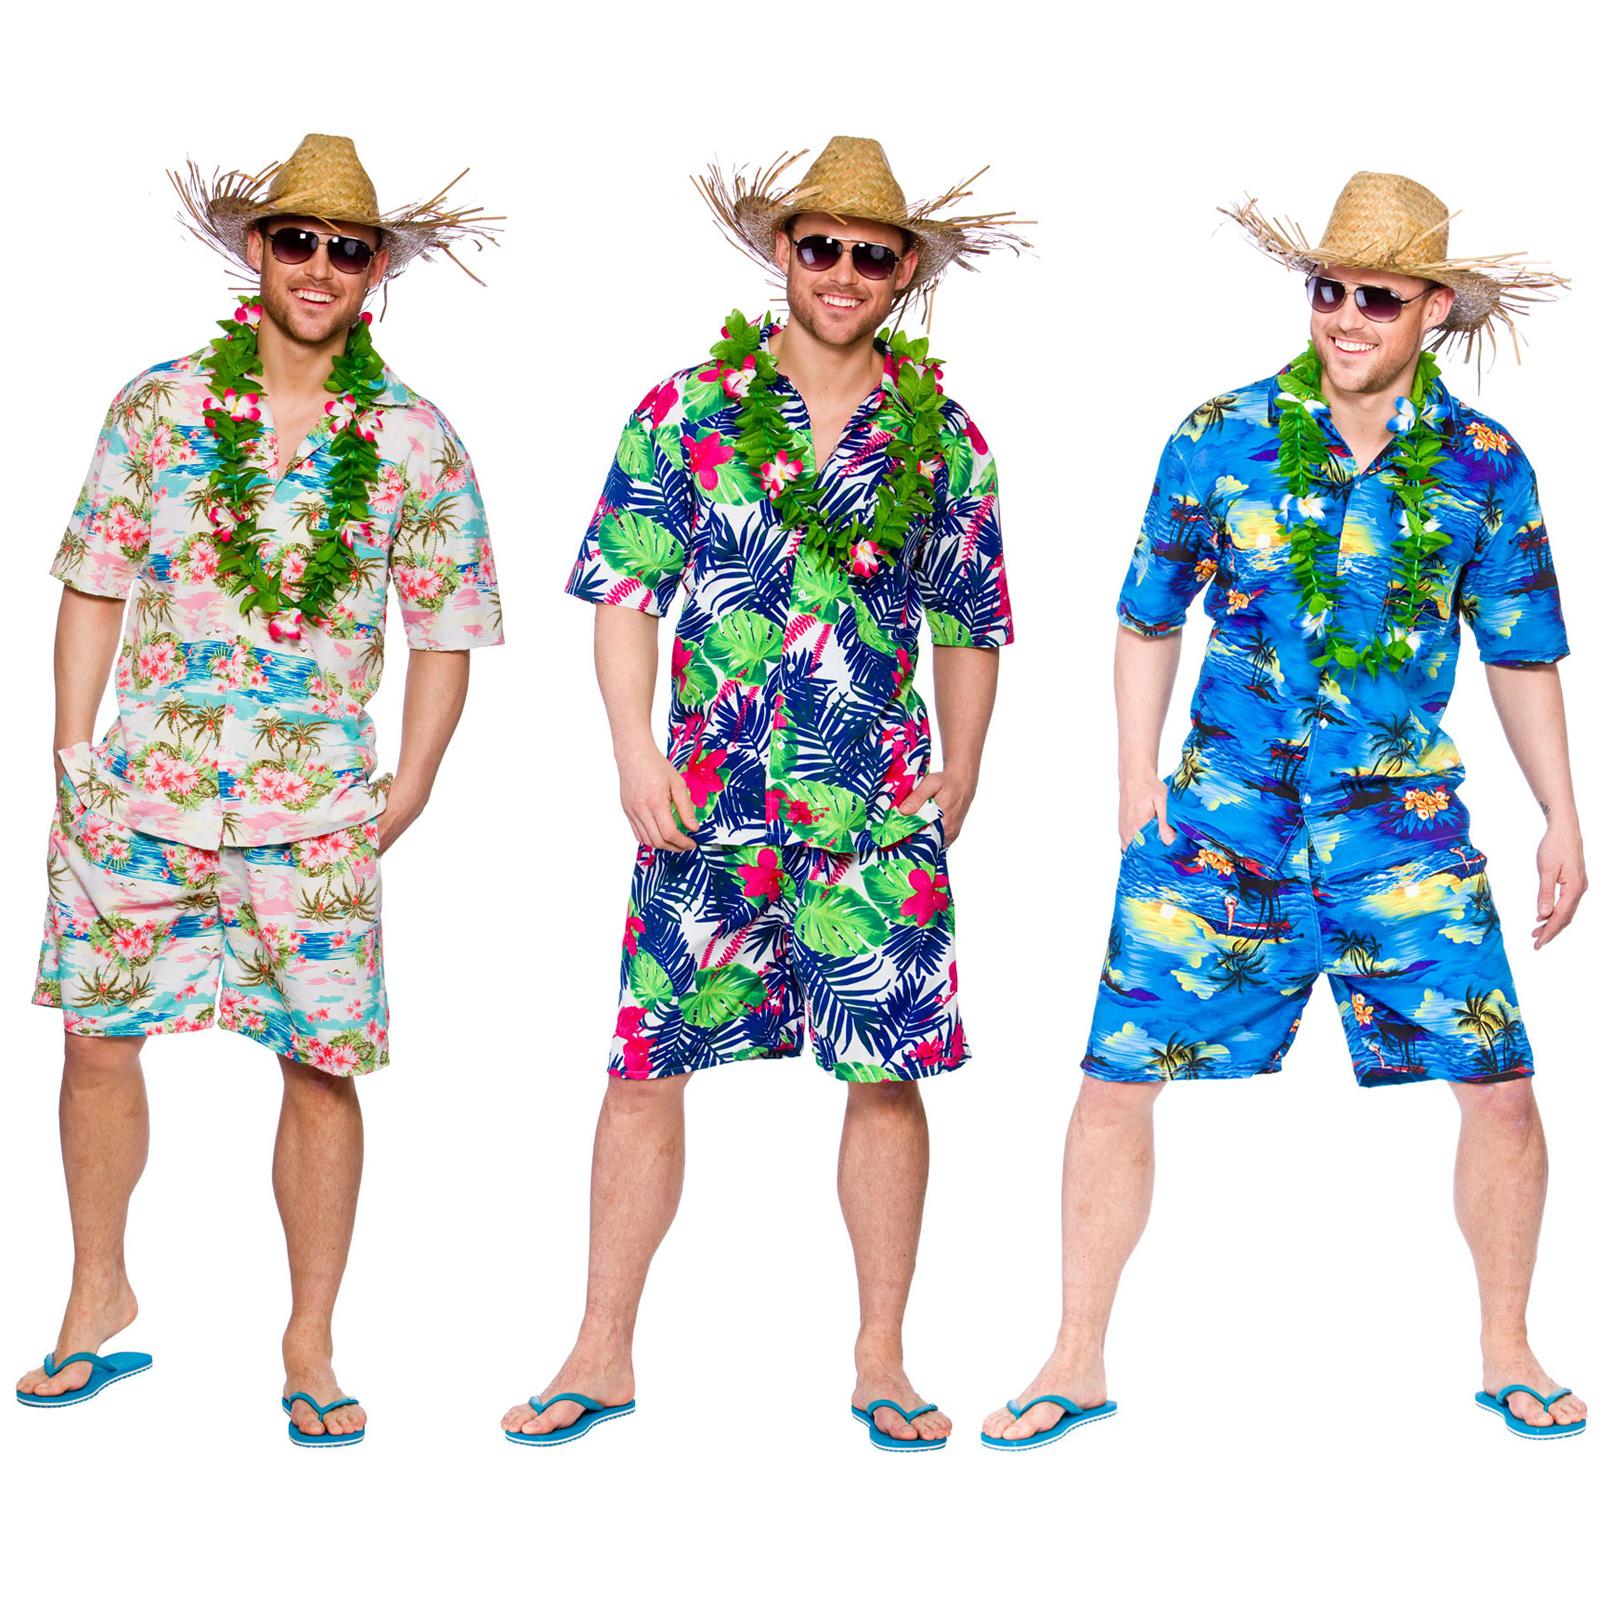 Images of summer dress up